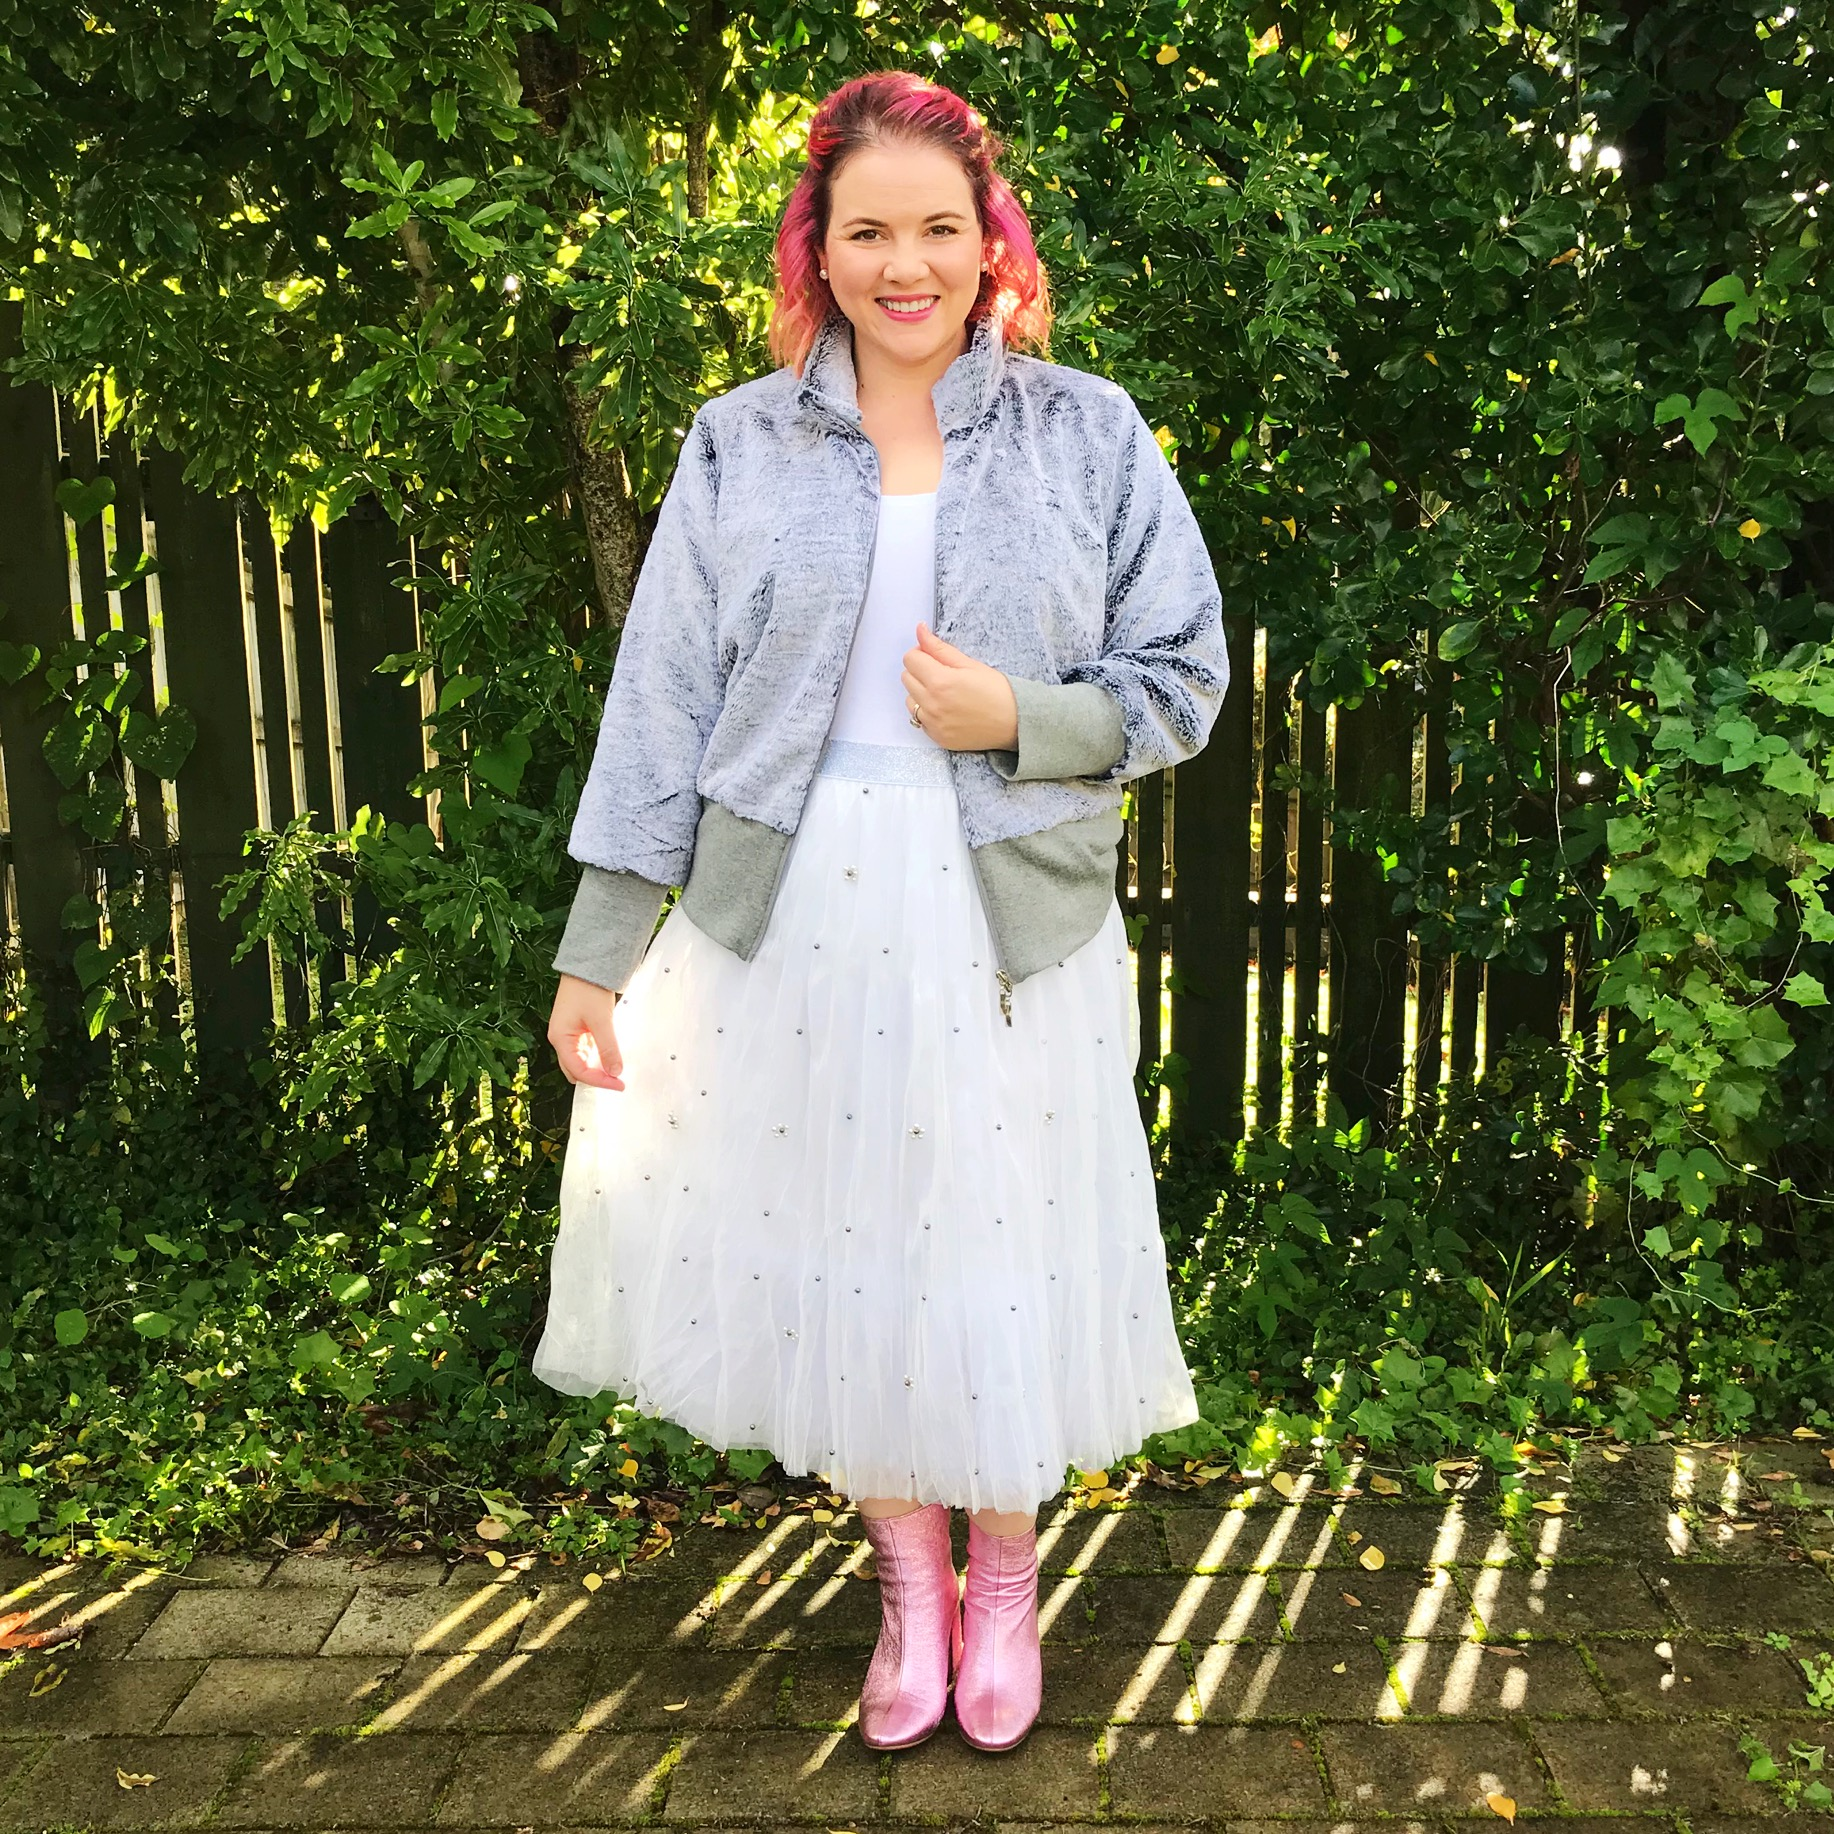 Libertine jacket, Trelise Cooper skirt, Mi Piaci boots.